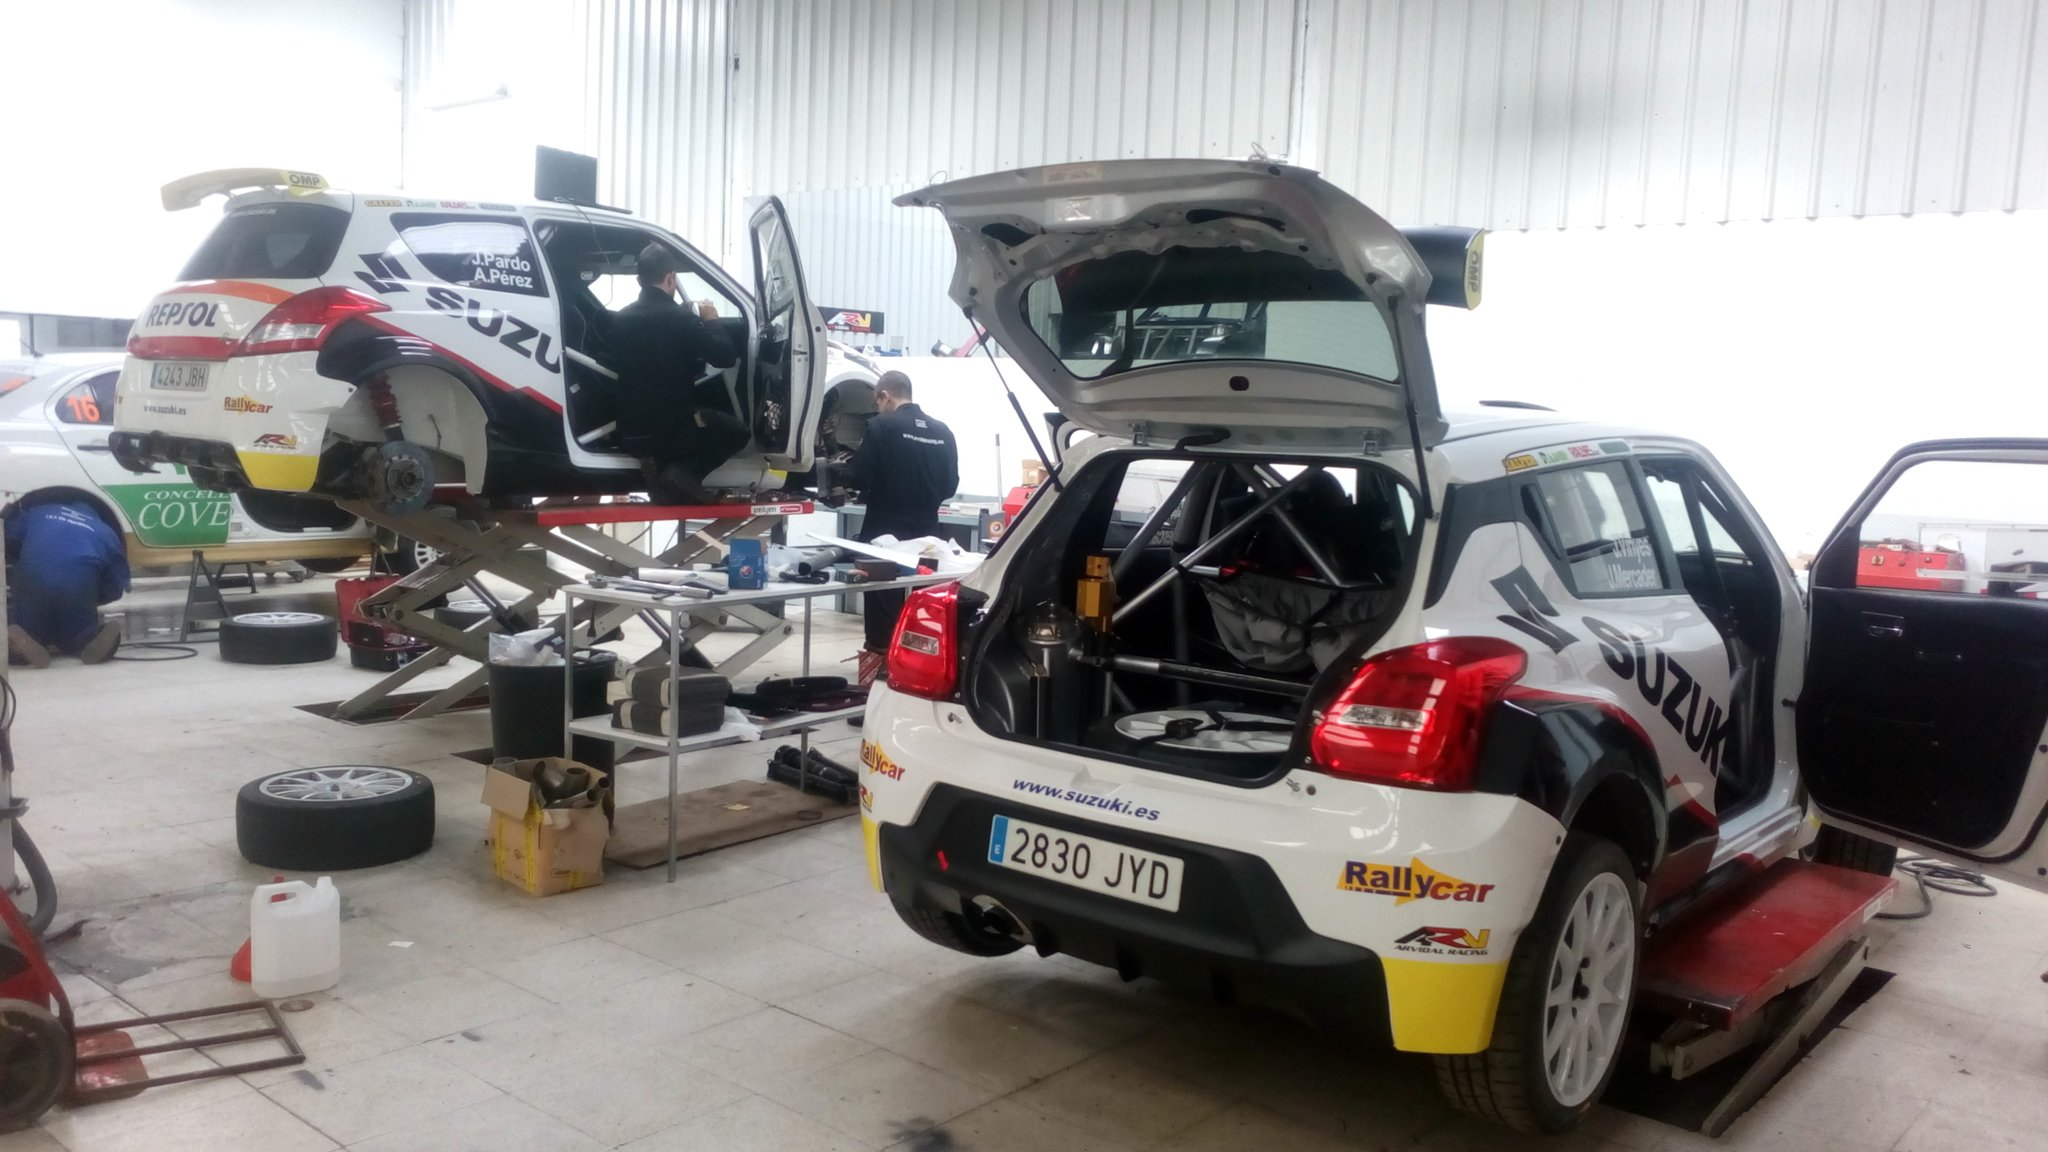 CERA: 36º Rallye Sierra Morena - Internacional [12-14 Abril] - Página 2 DagFDoeX0AAGj4p